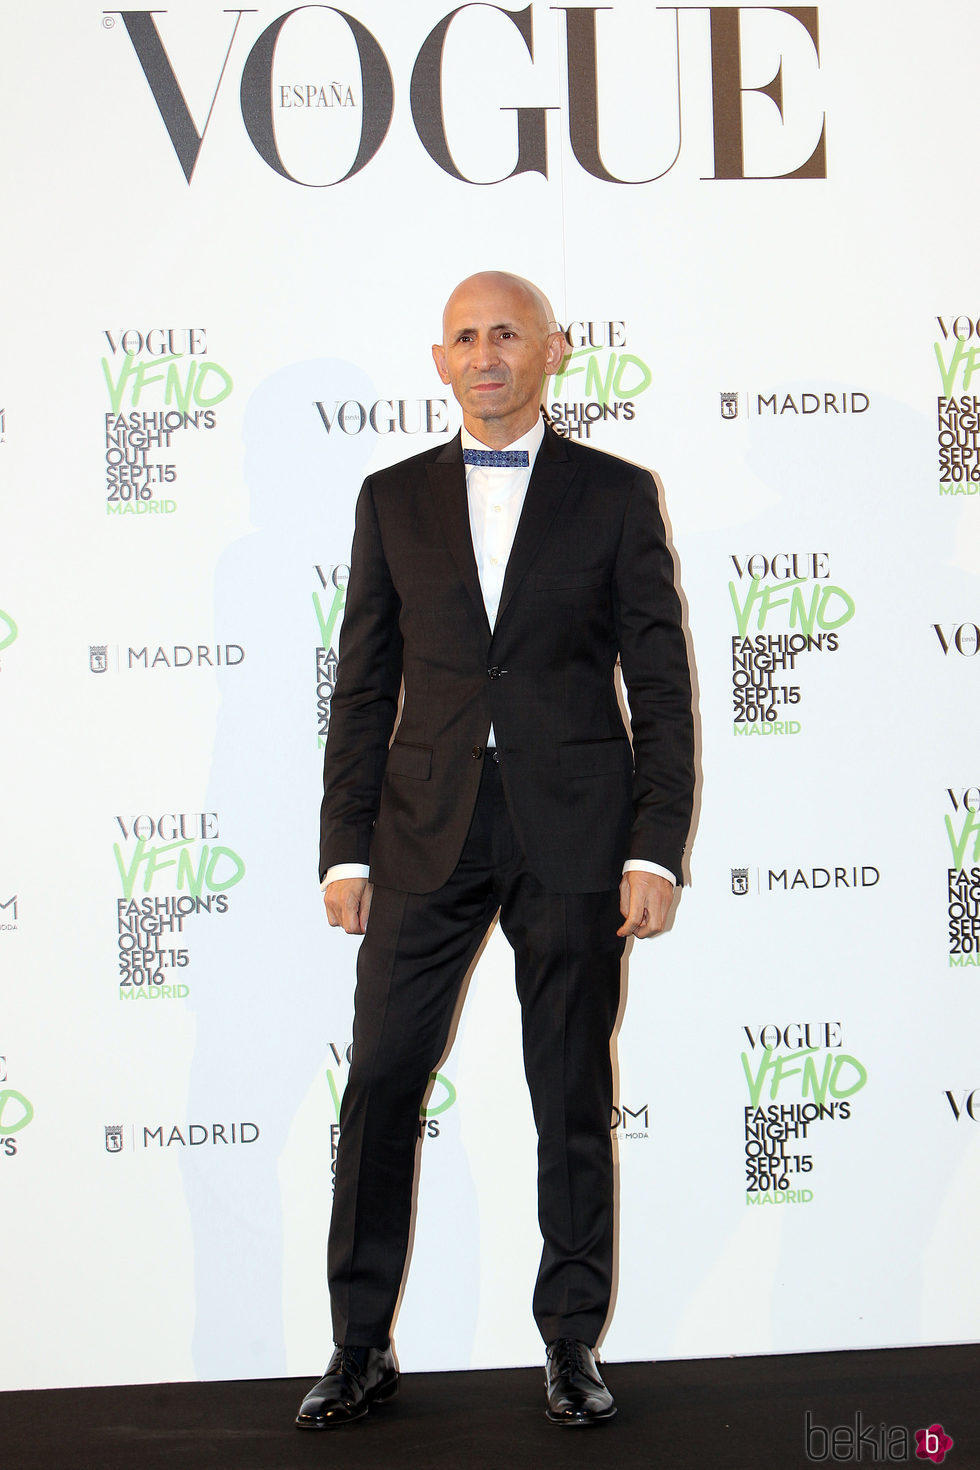 Modesto Lomba en el photocall de Vogue's Fashion Night Out 2016